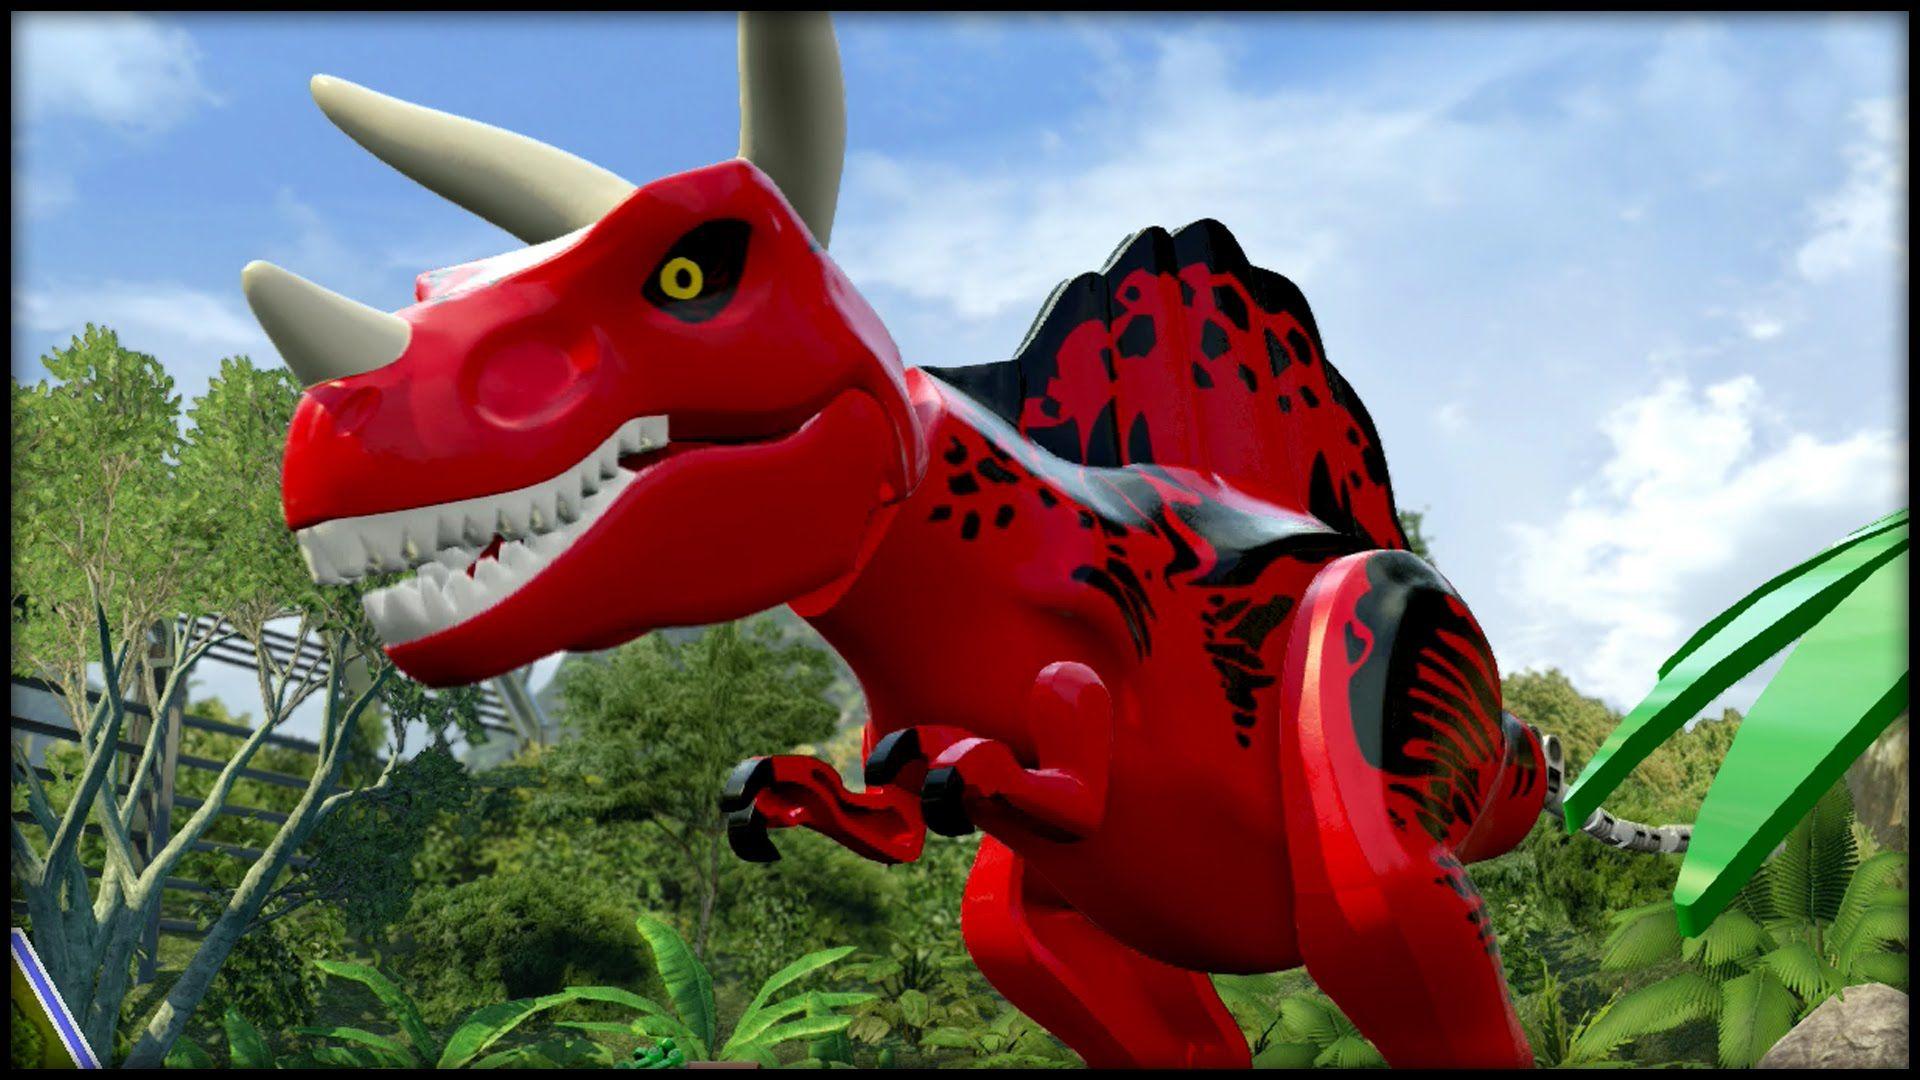 LEGO Jurassic World - DEADPOOLREX!   LEGO JURASSIC WORLD   Pinterest